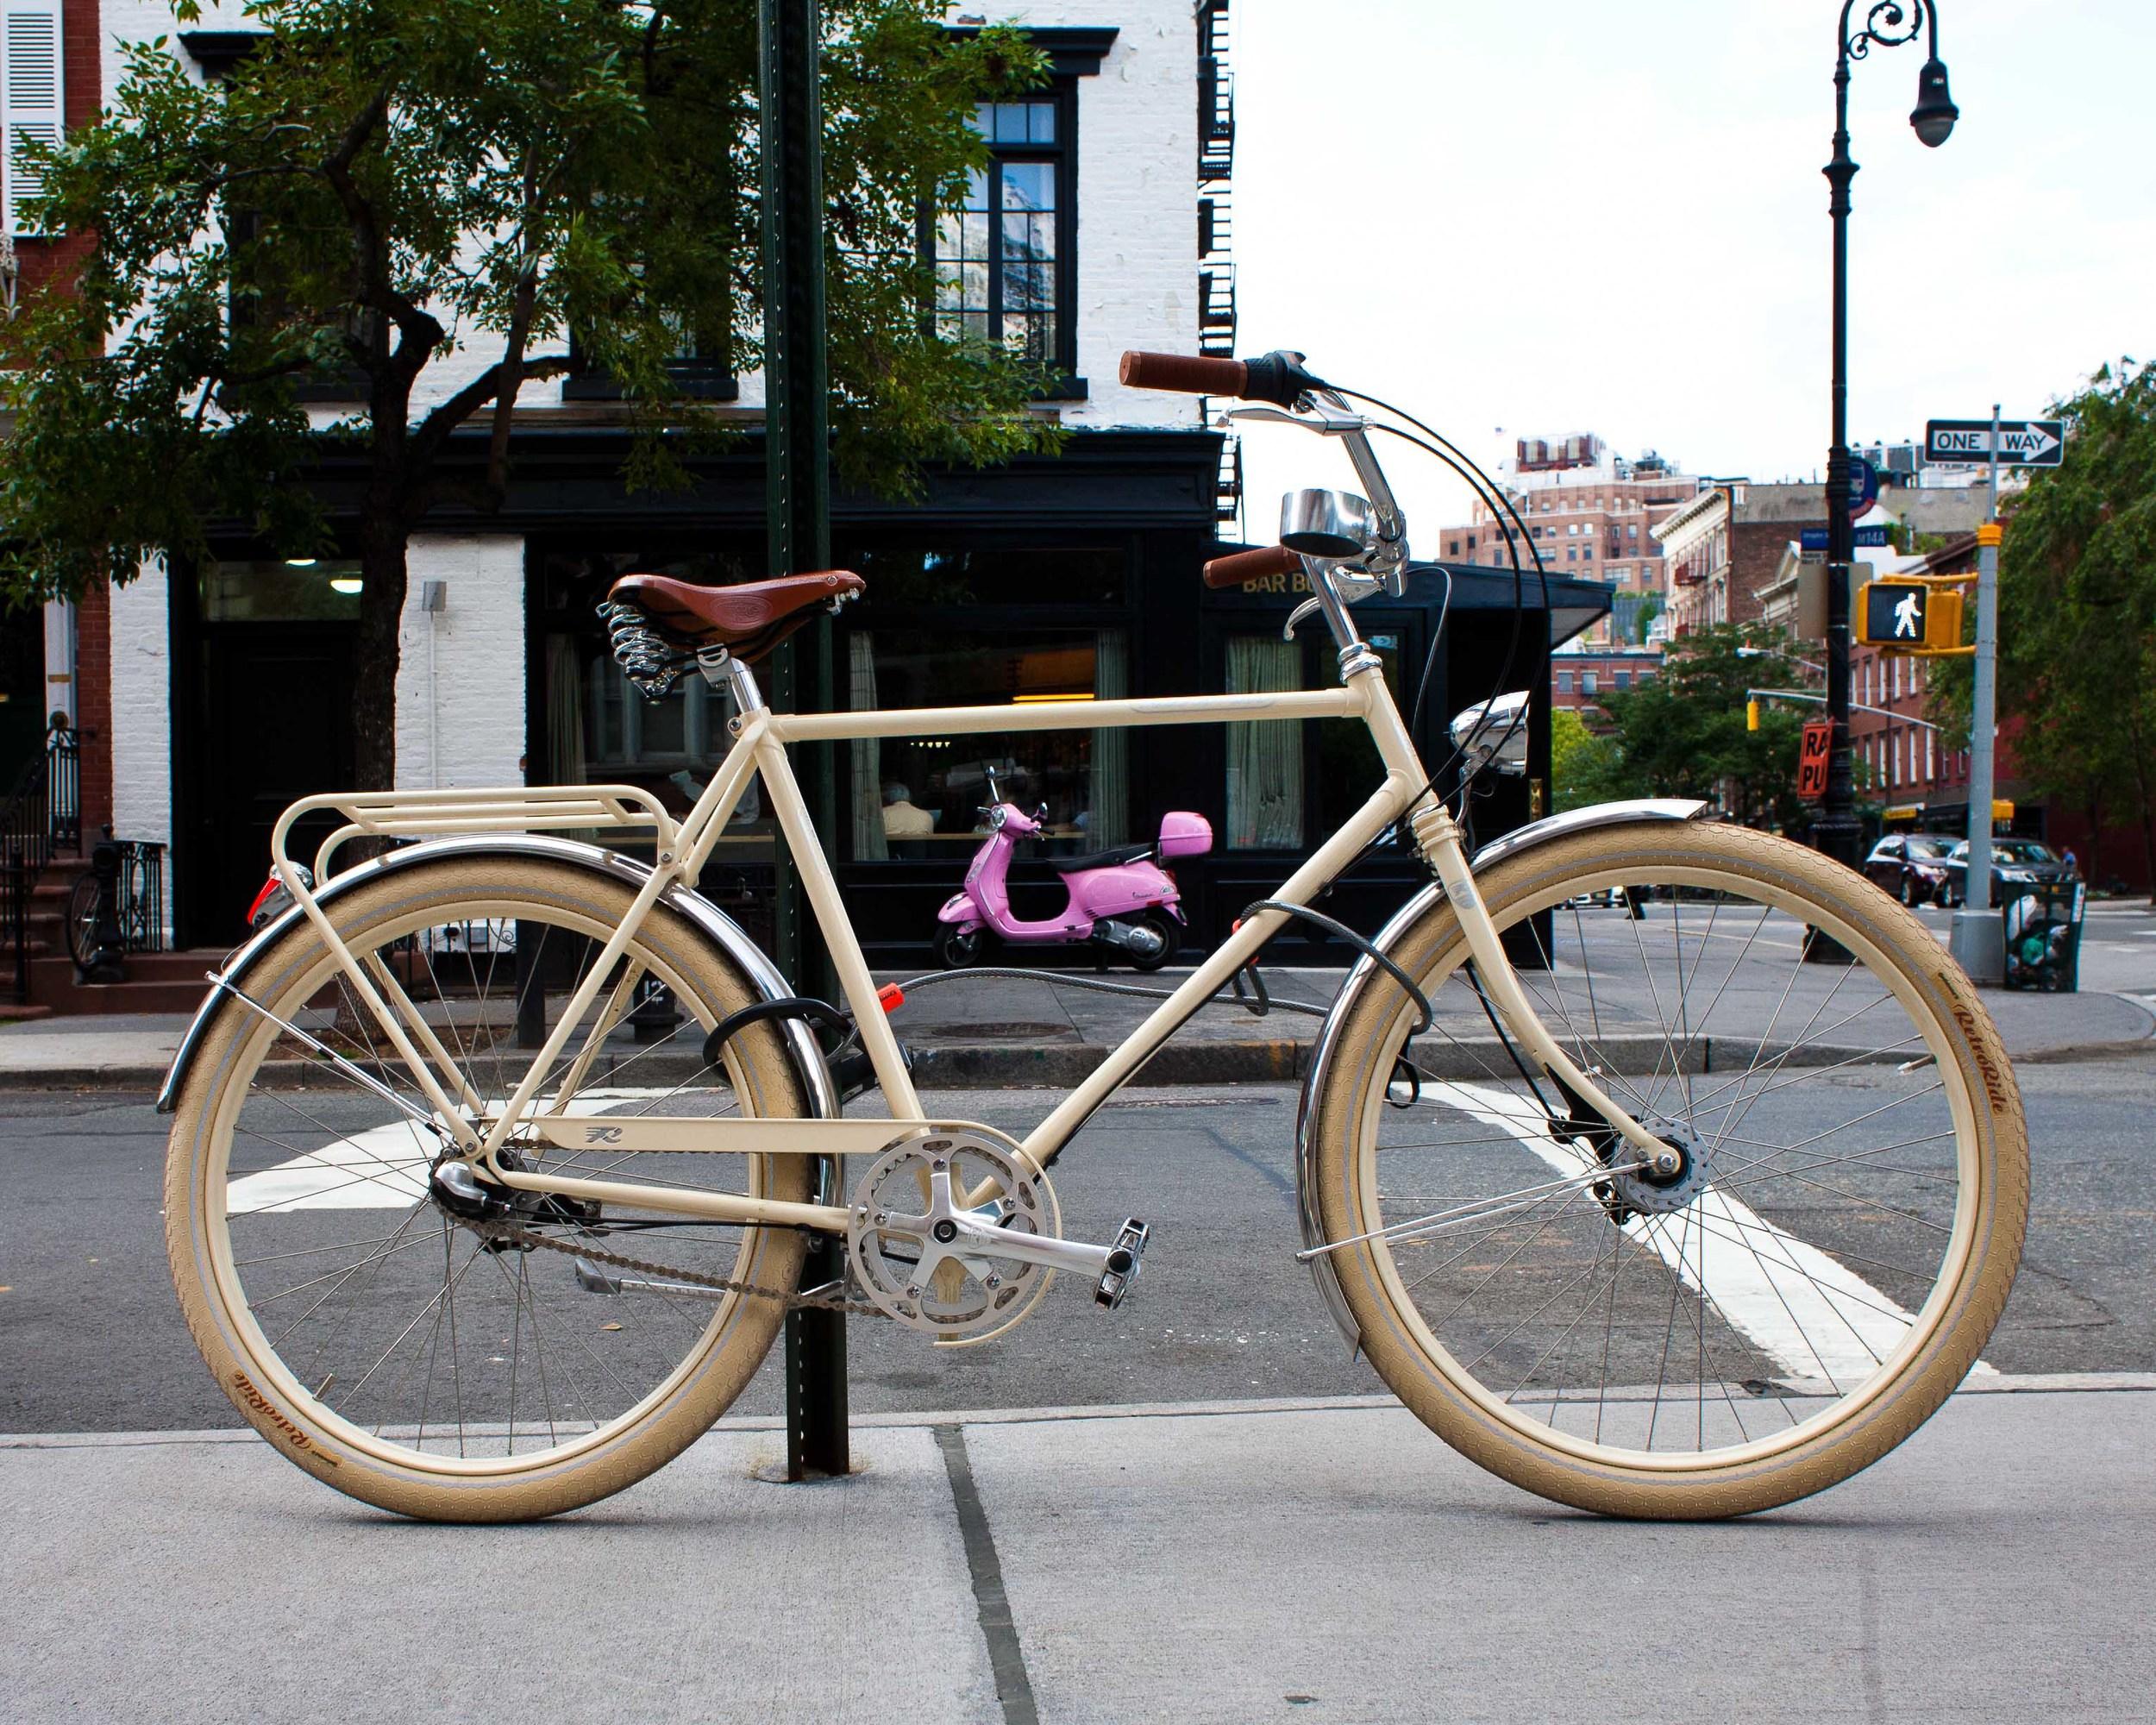 Bikescapes-28.jpg